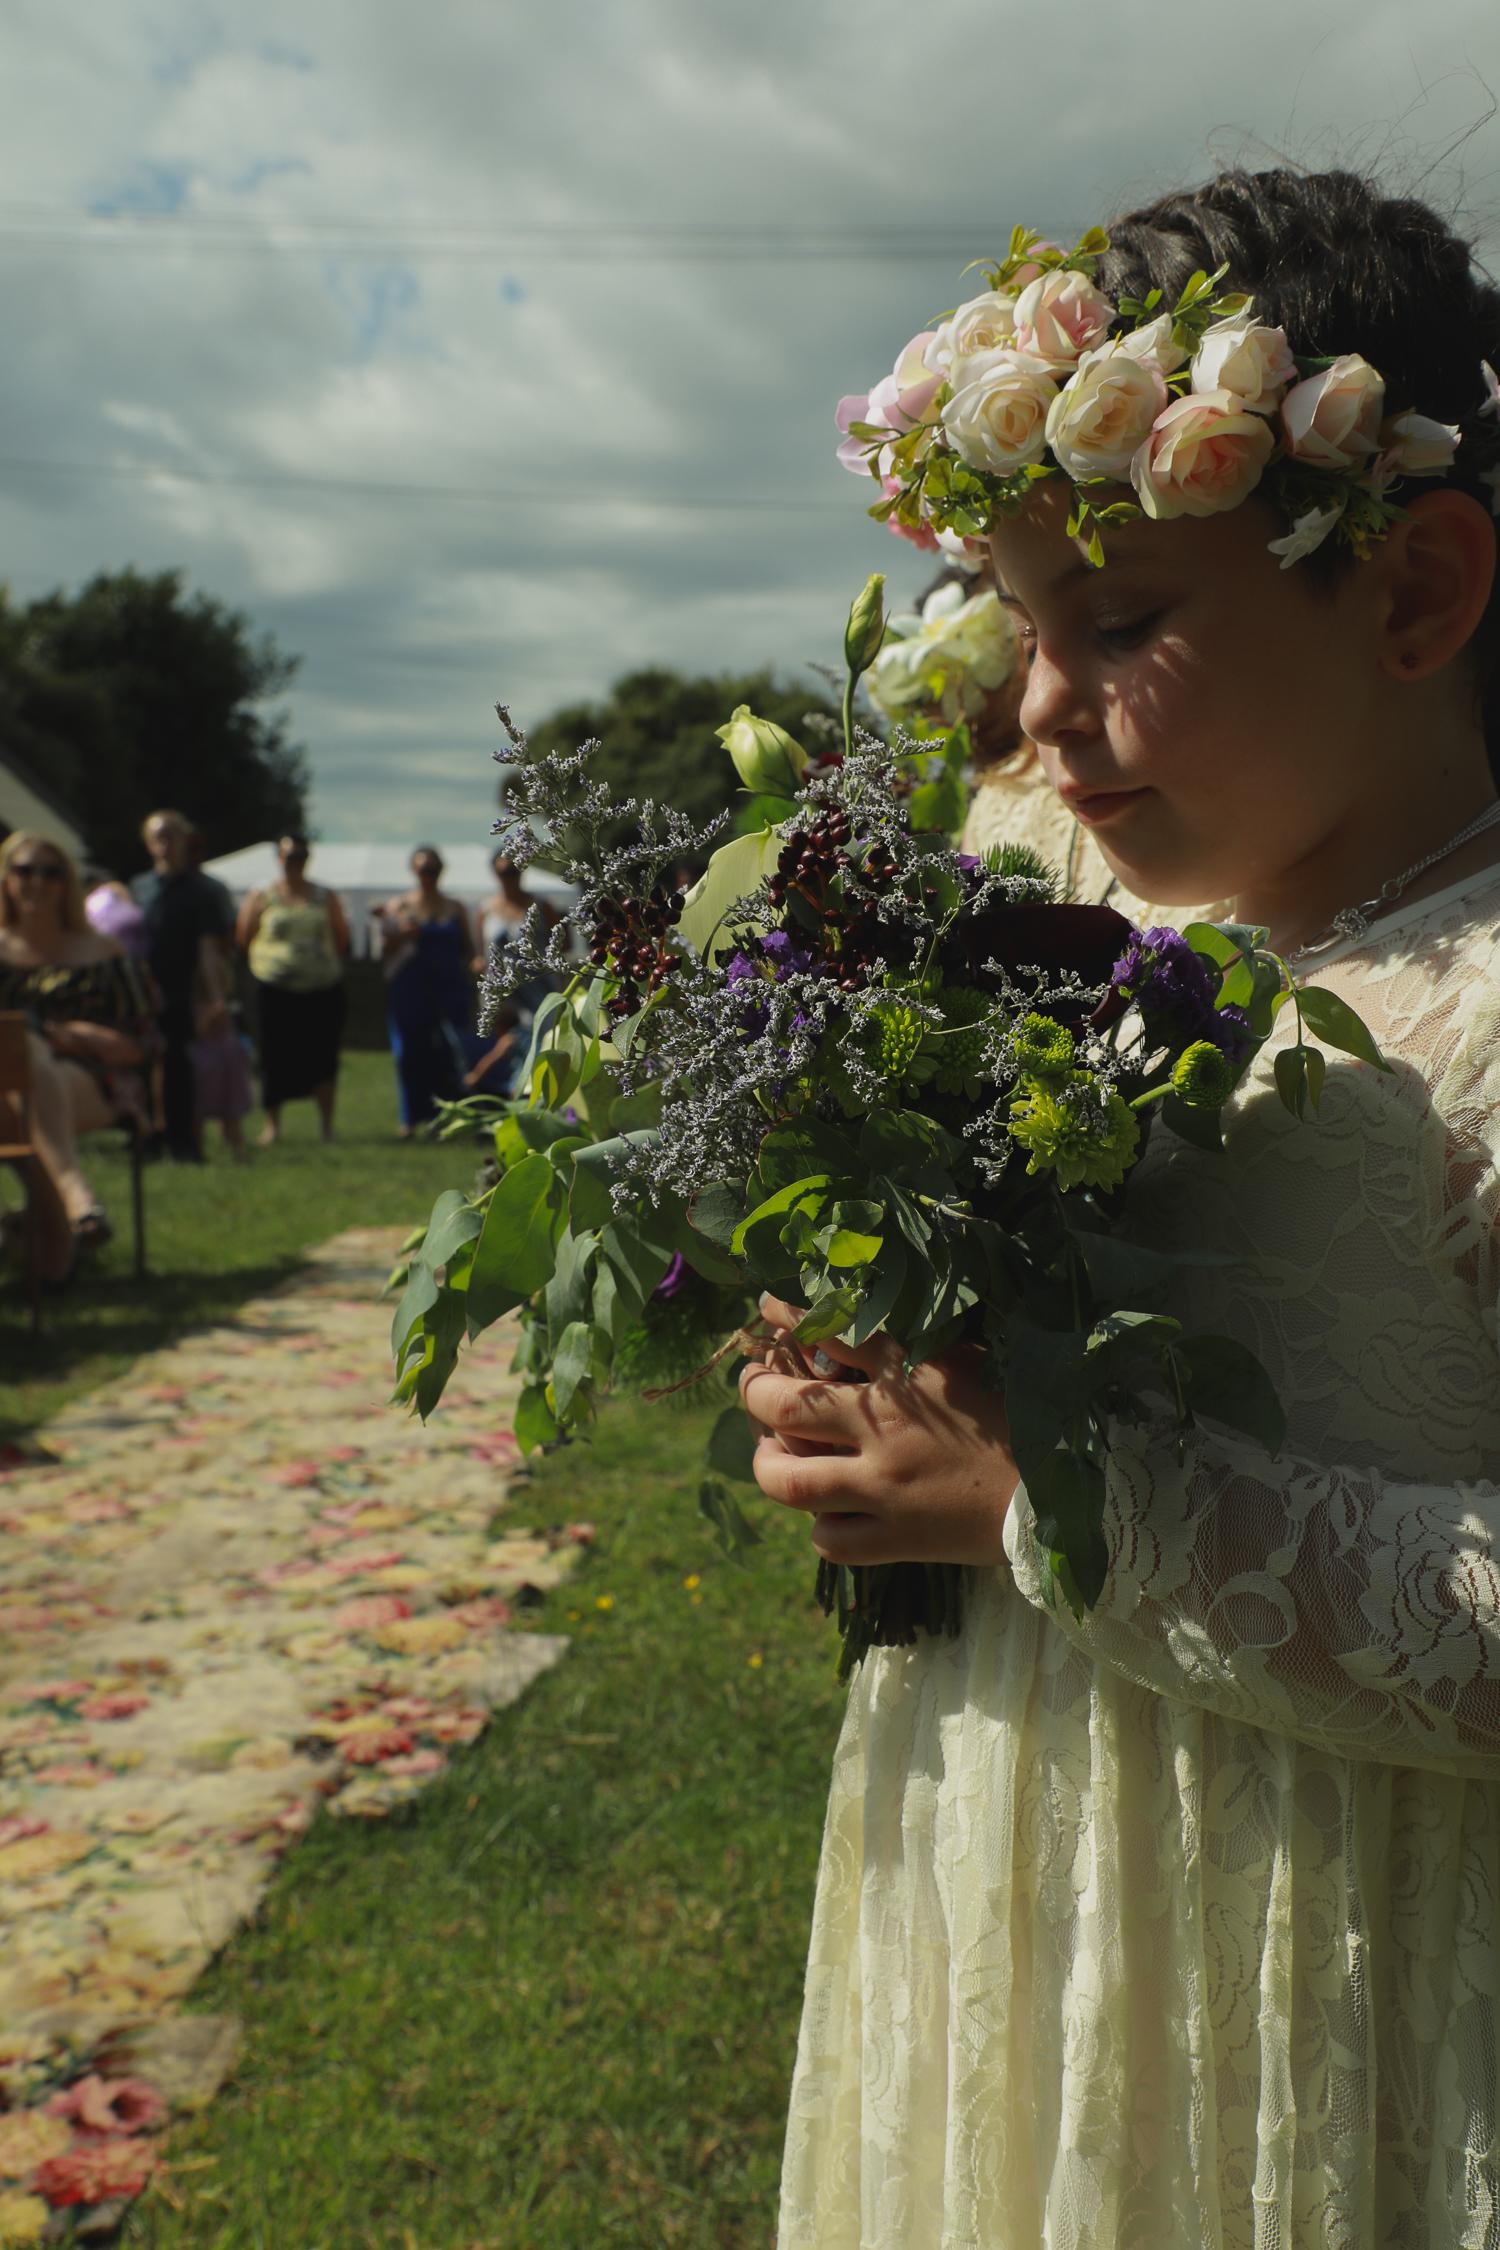 wedding-photography-flower-girl-at-ceremony.jpg